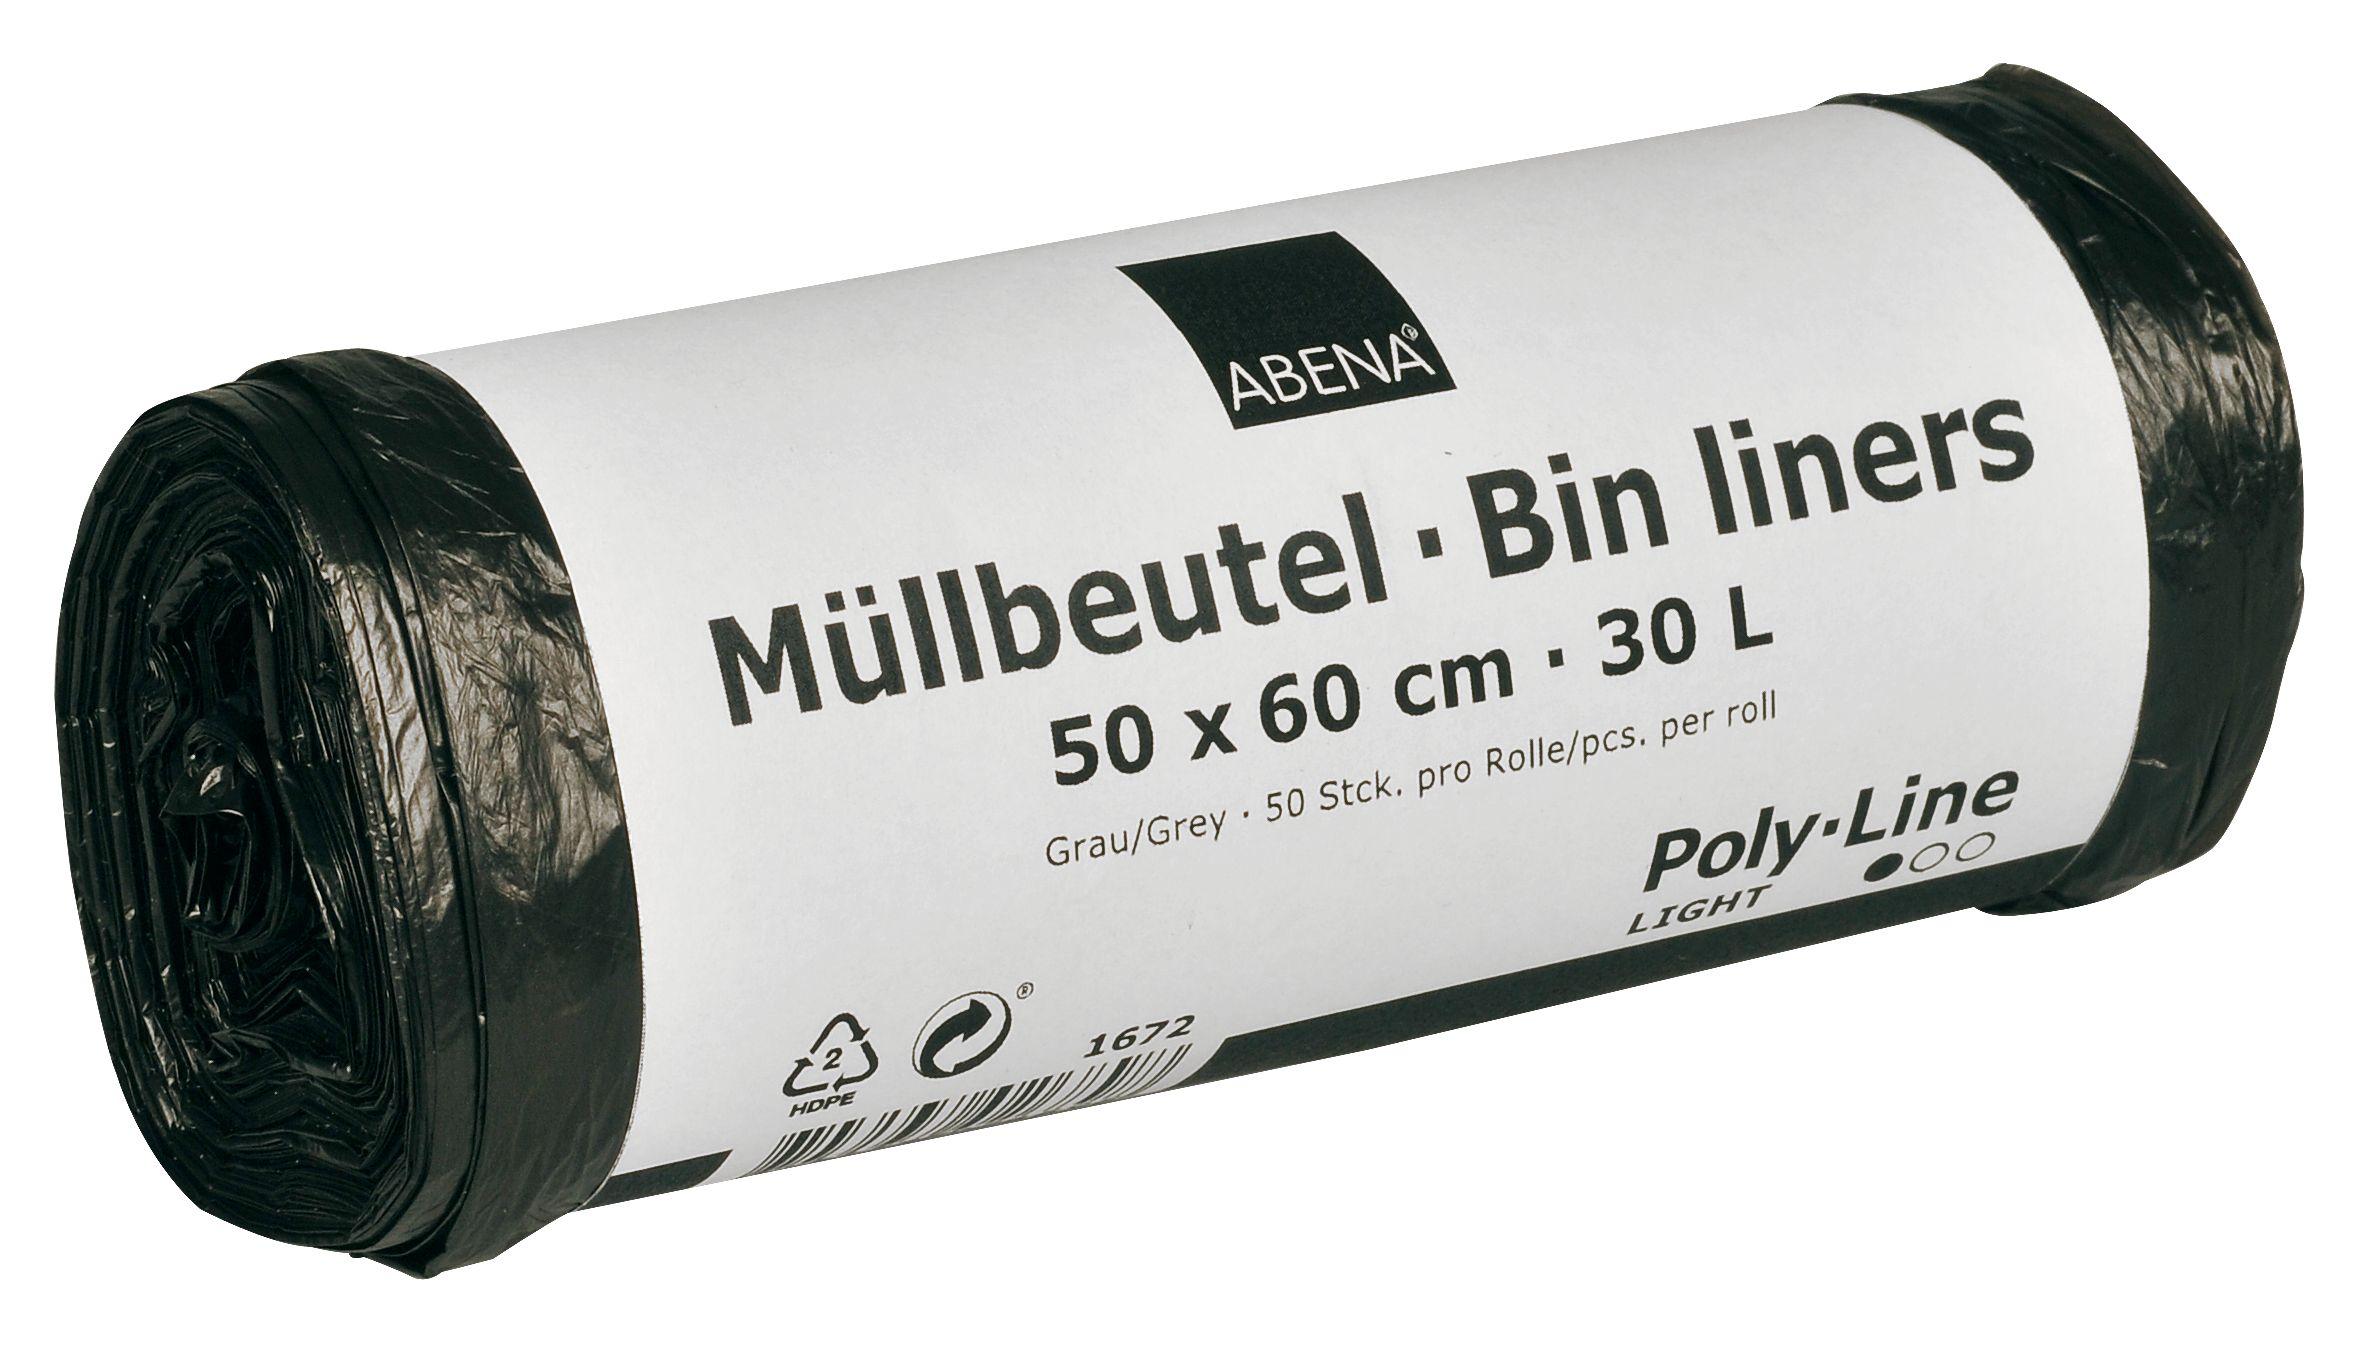 Poly-Line Müllbeutel,4,5my, HDPE, 40 x 50 Stück, grau, 50 x 60 cm/ 30 Liter